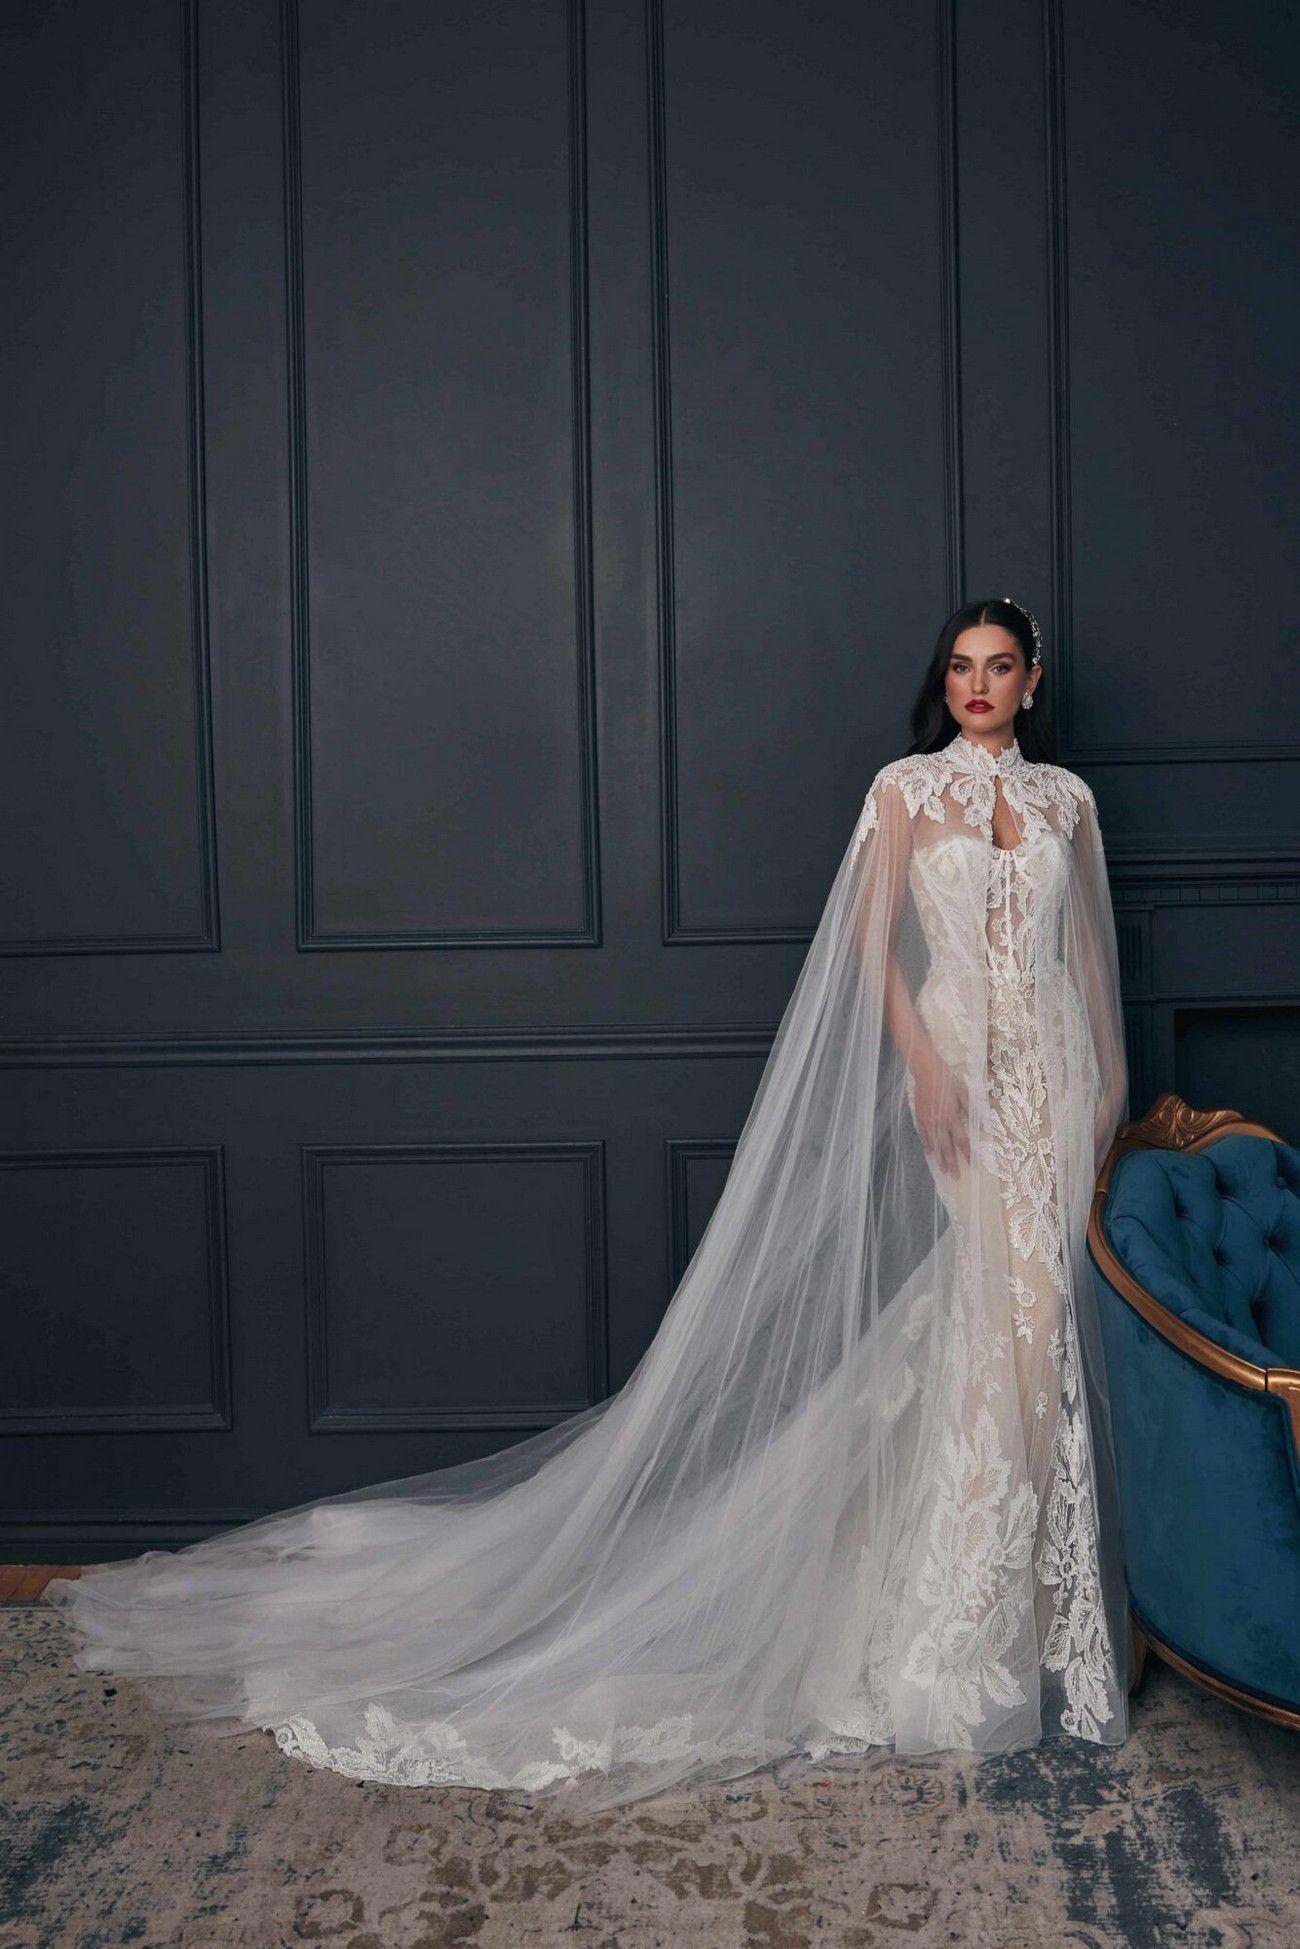 https://www.bridalreflections.com/wp-content/uploads/2021/06/121235-4-Ariel-min-1334x2000.jpg